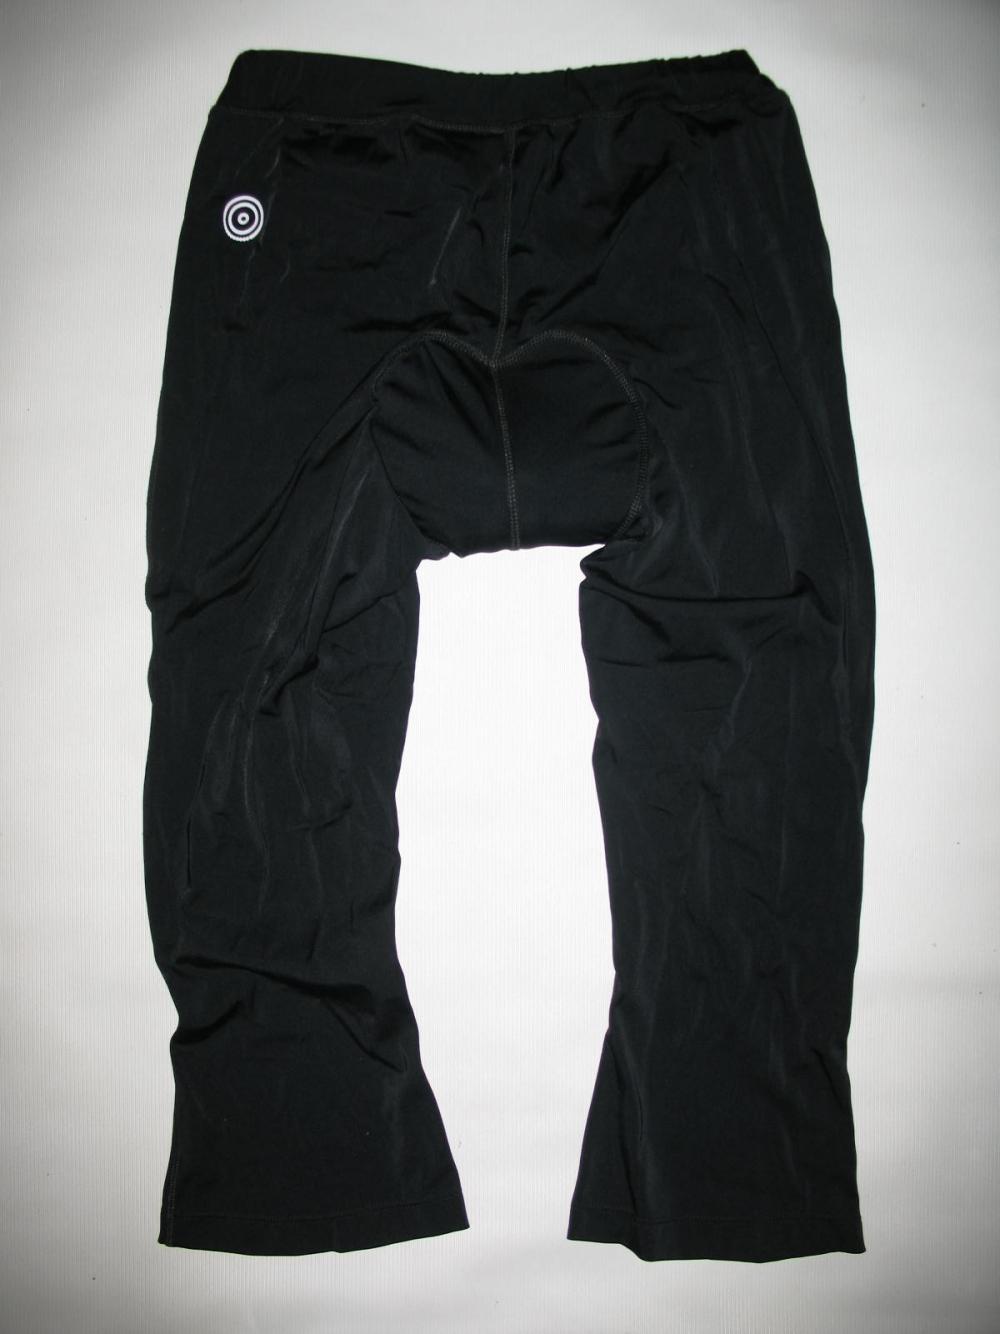 Велошорты K-TEC cycling 3/4 shorts lady (размер 40/L) - 1